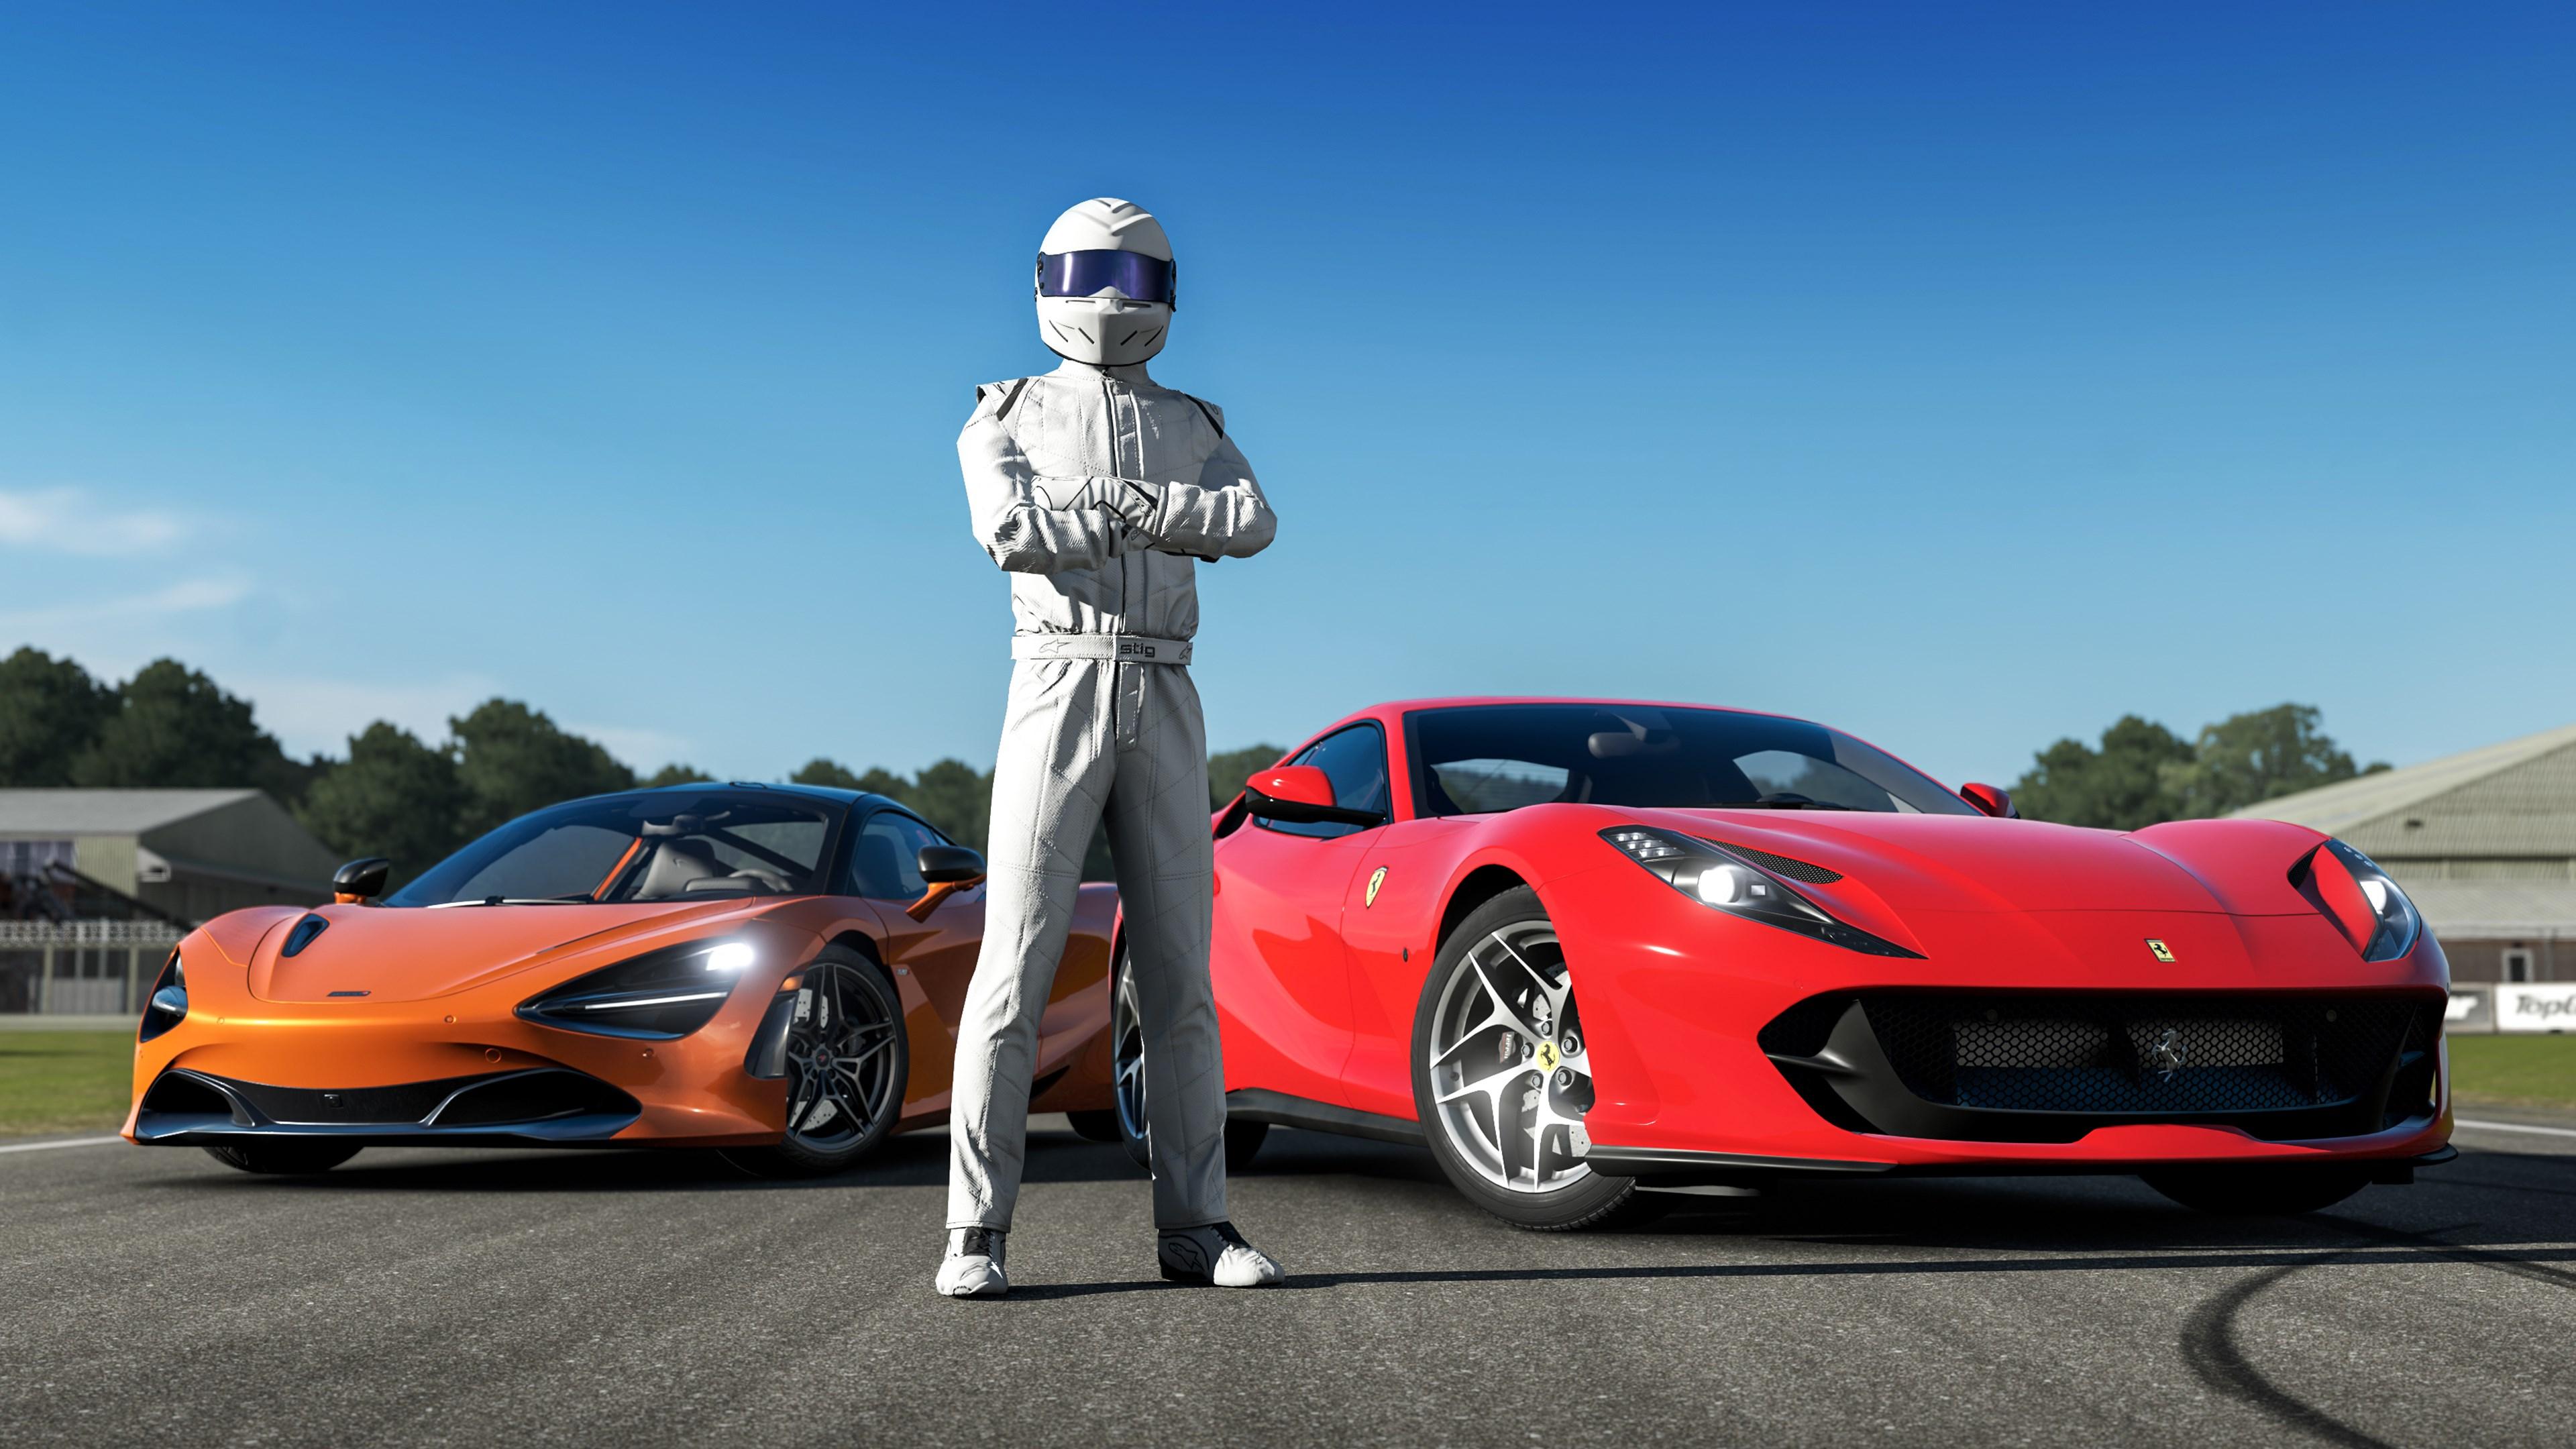 Buy Top Gear Forza Motorsport 7 Car Pack Microsoft Store